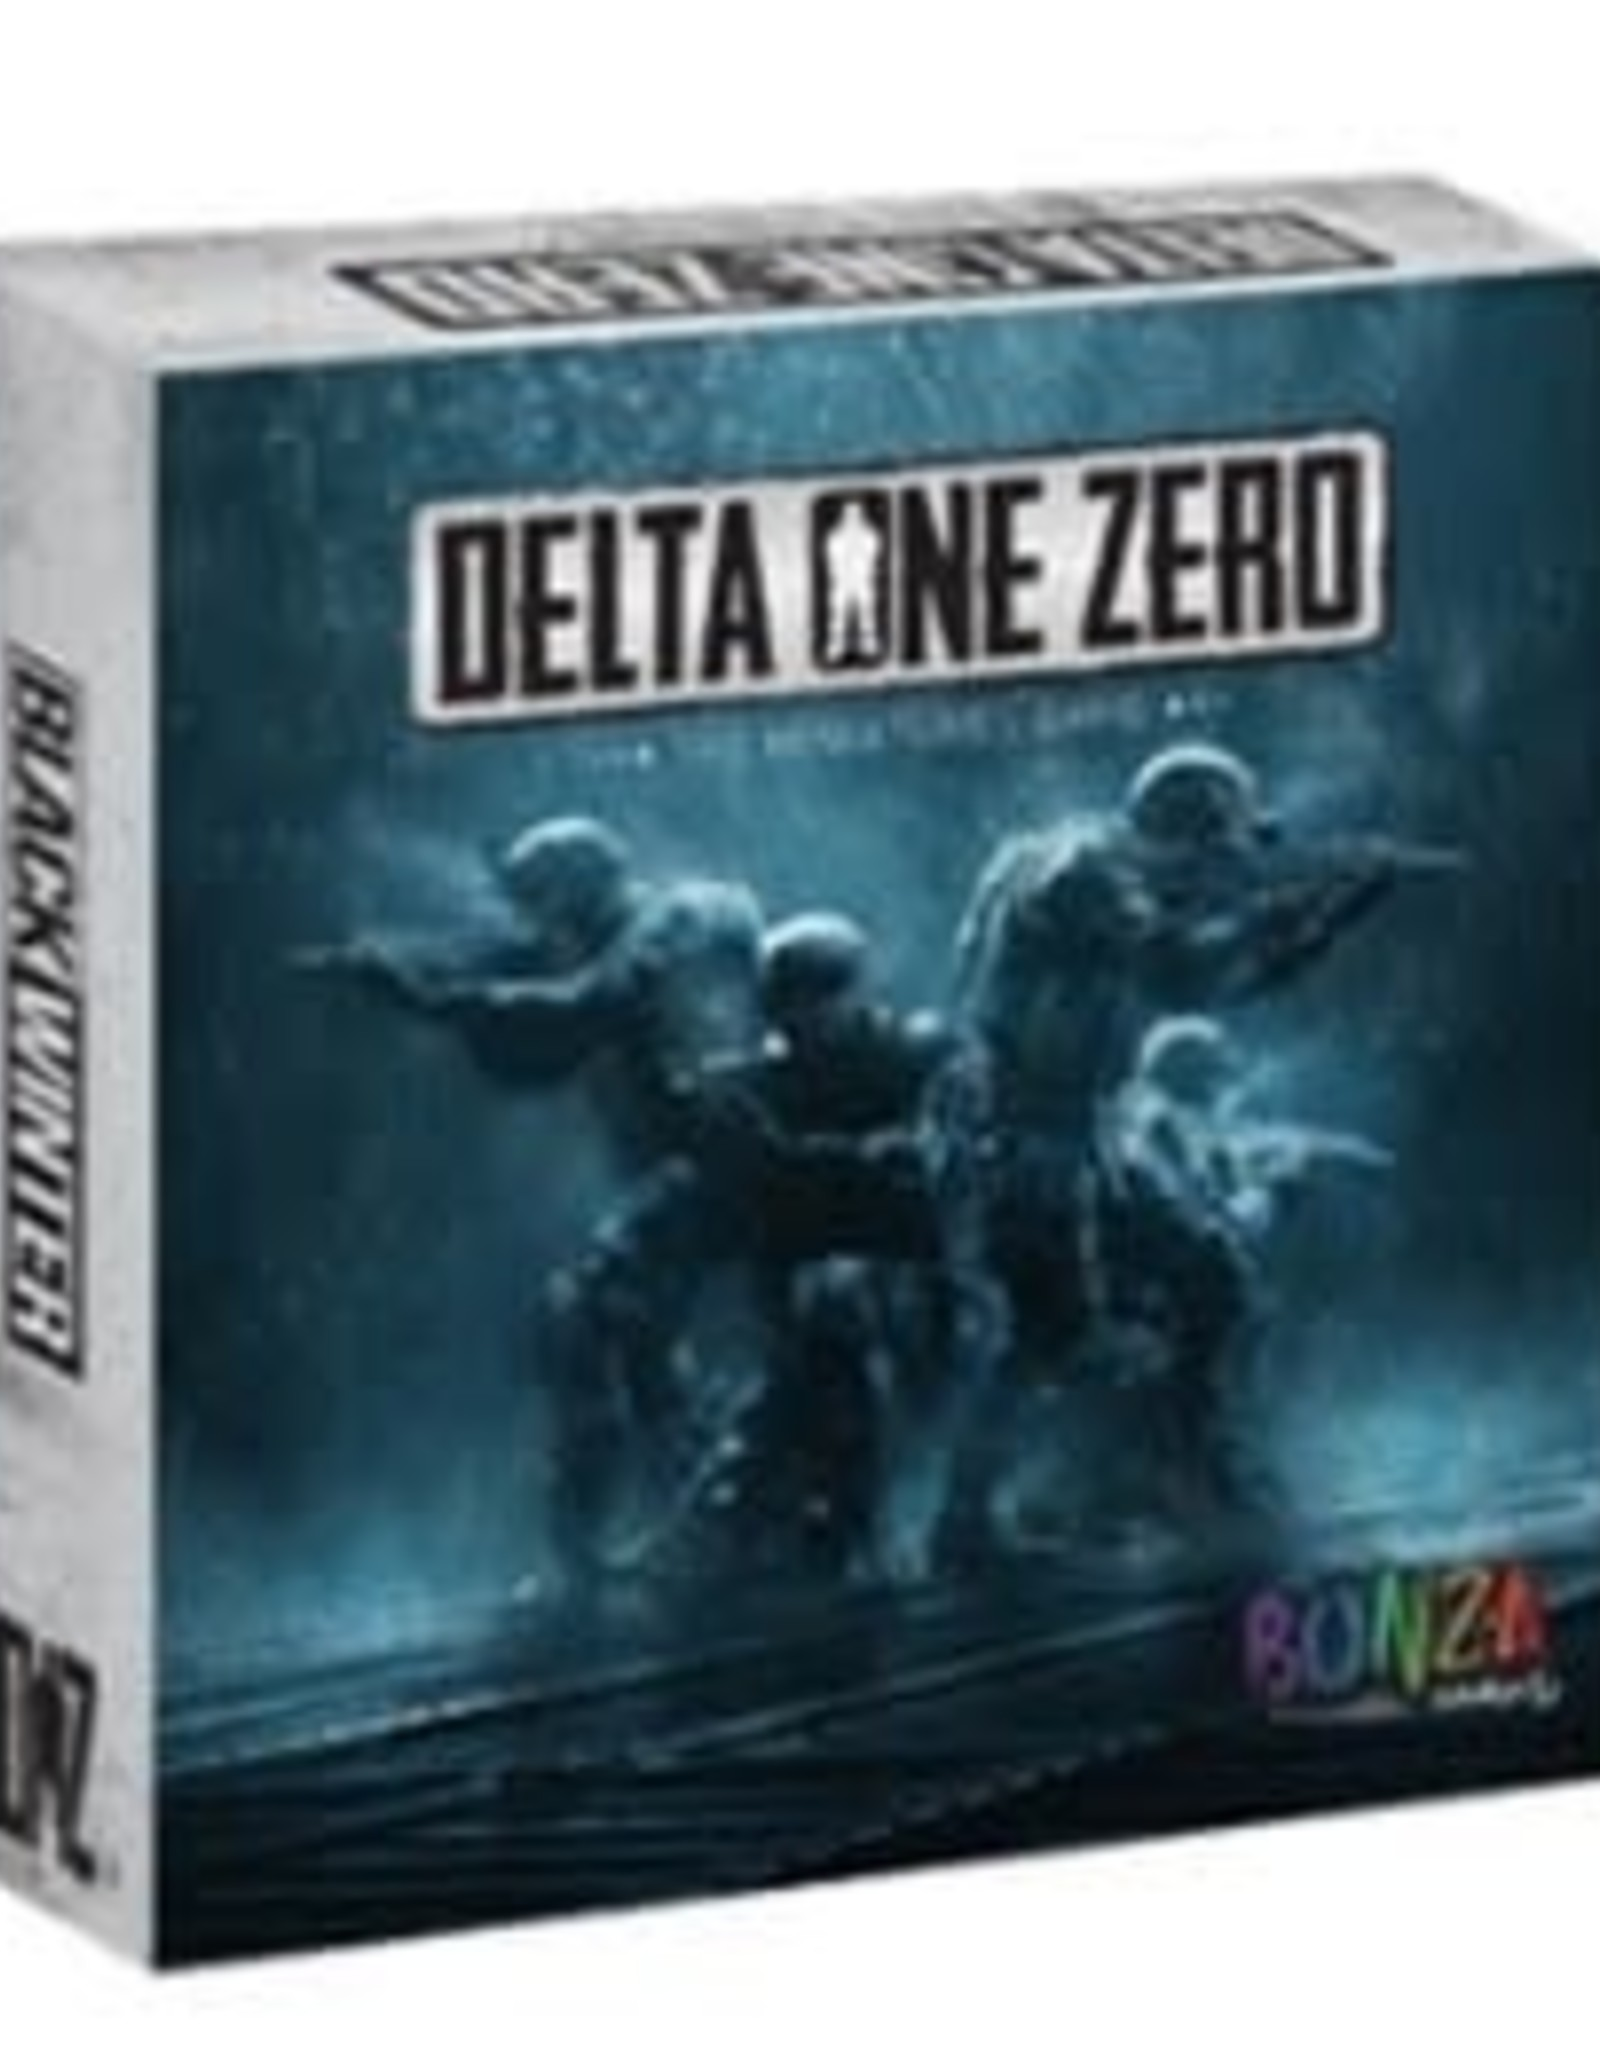 Bonza Delta One Zero:  Black Winter Starter Set